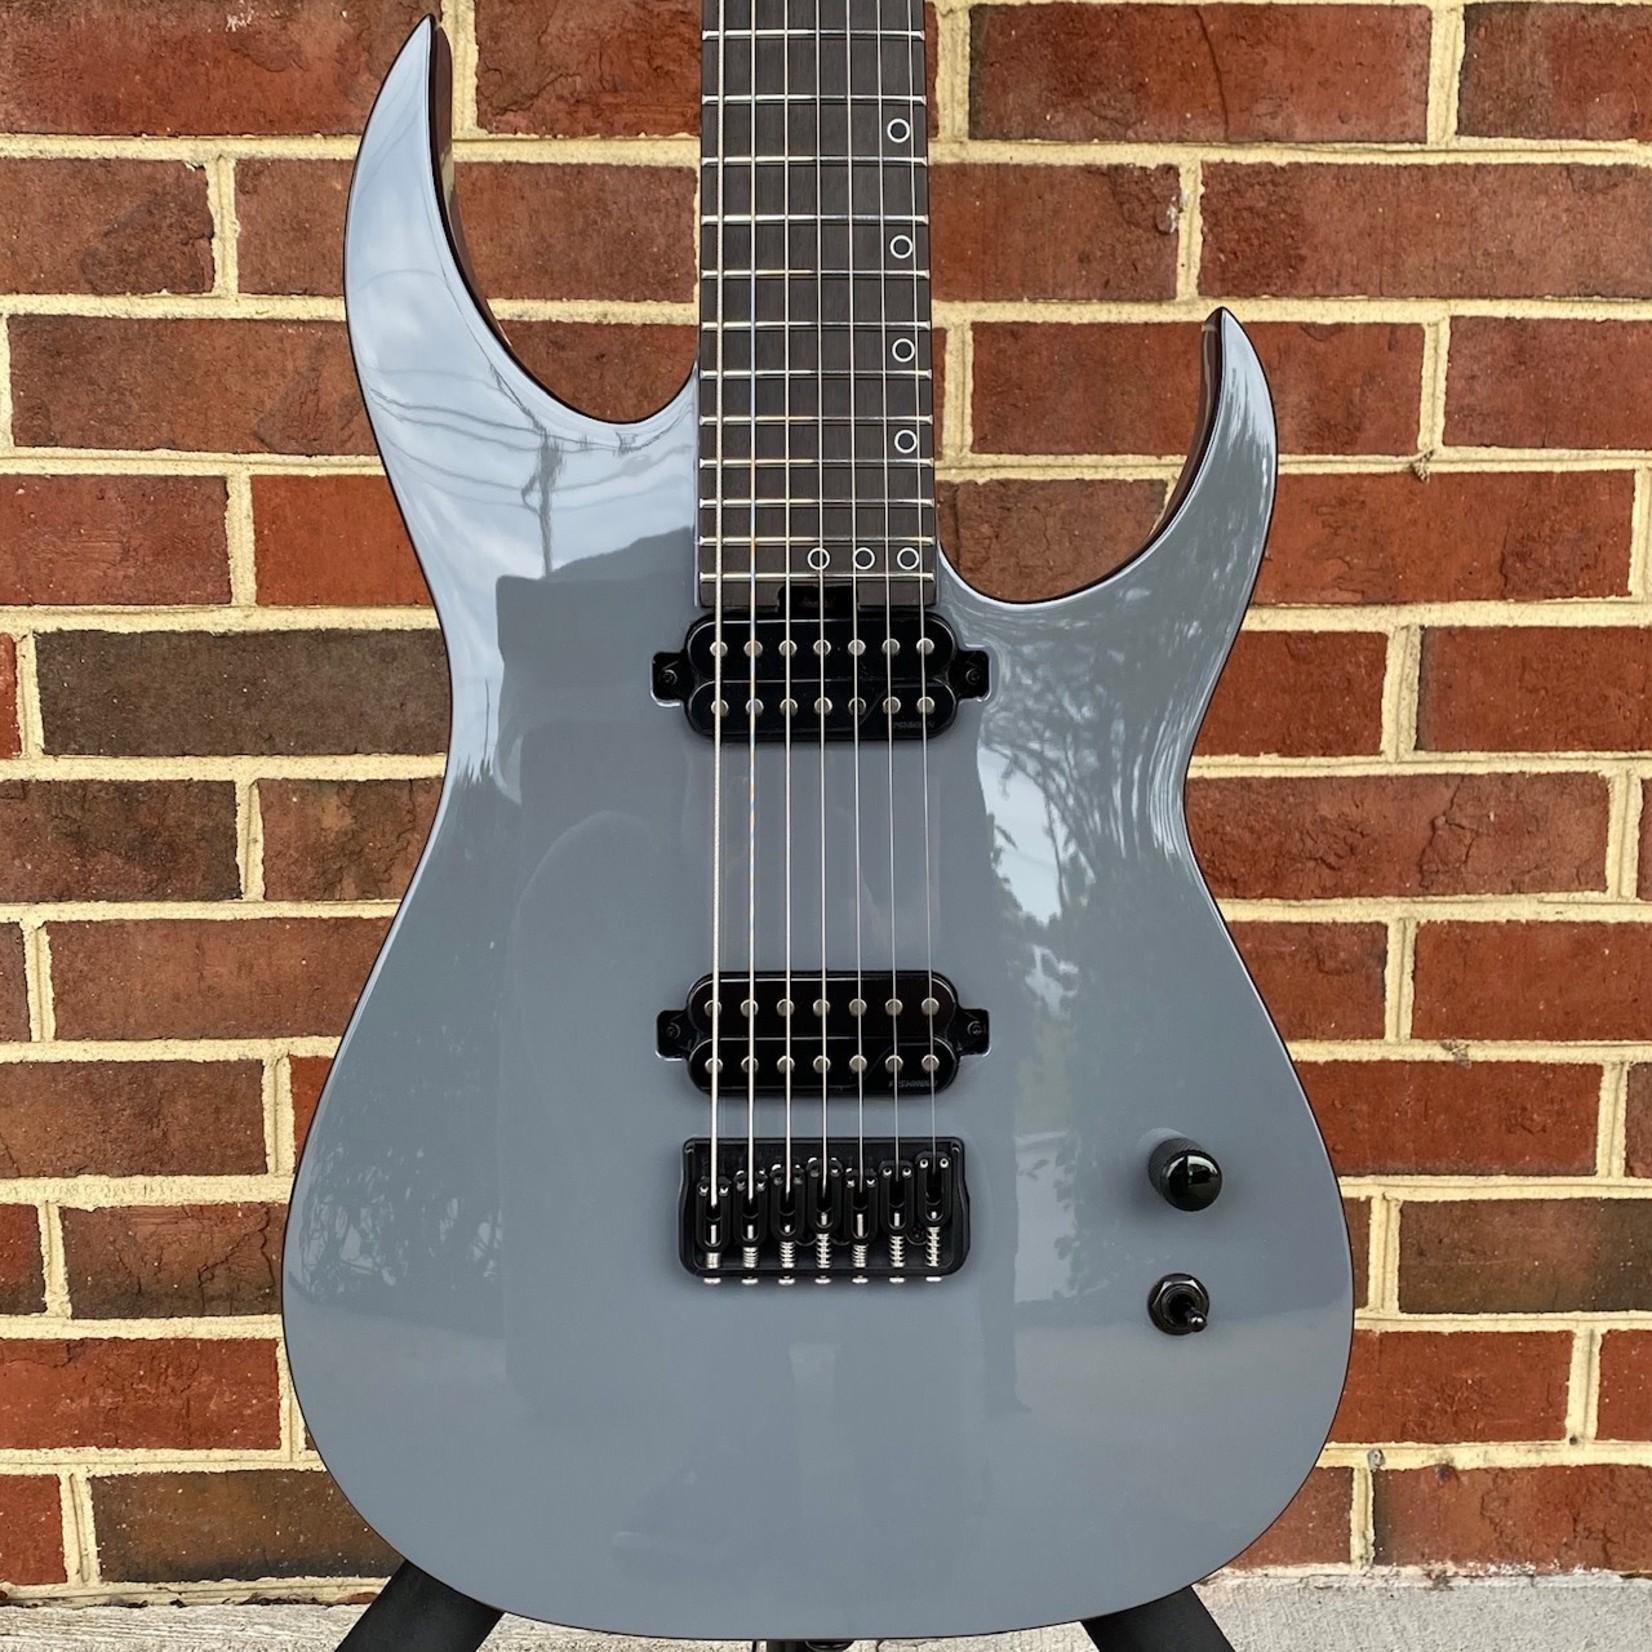 Schecter Guitar Research Schecter Keith Merrow MK-III, Telesto Grey, Fishman Fluence Pickups, Ebony Fretboard, Locking Tuners, Luminlay Side Markers